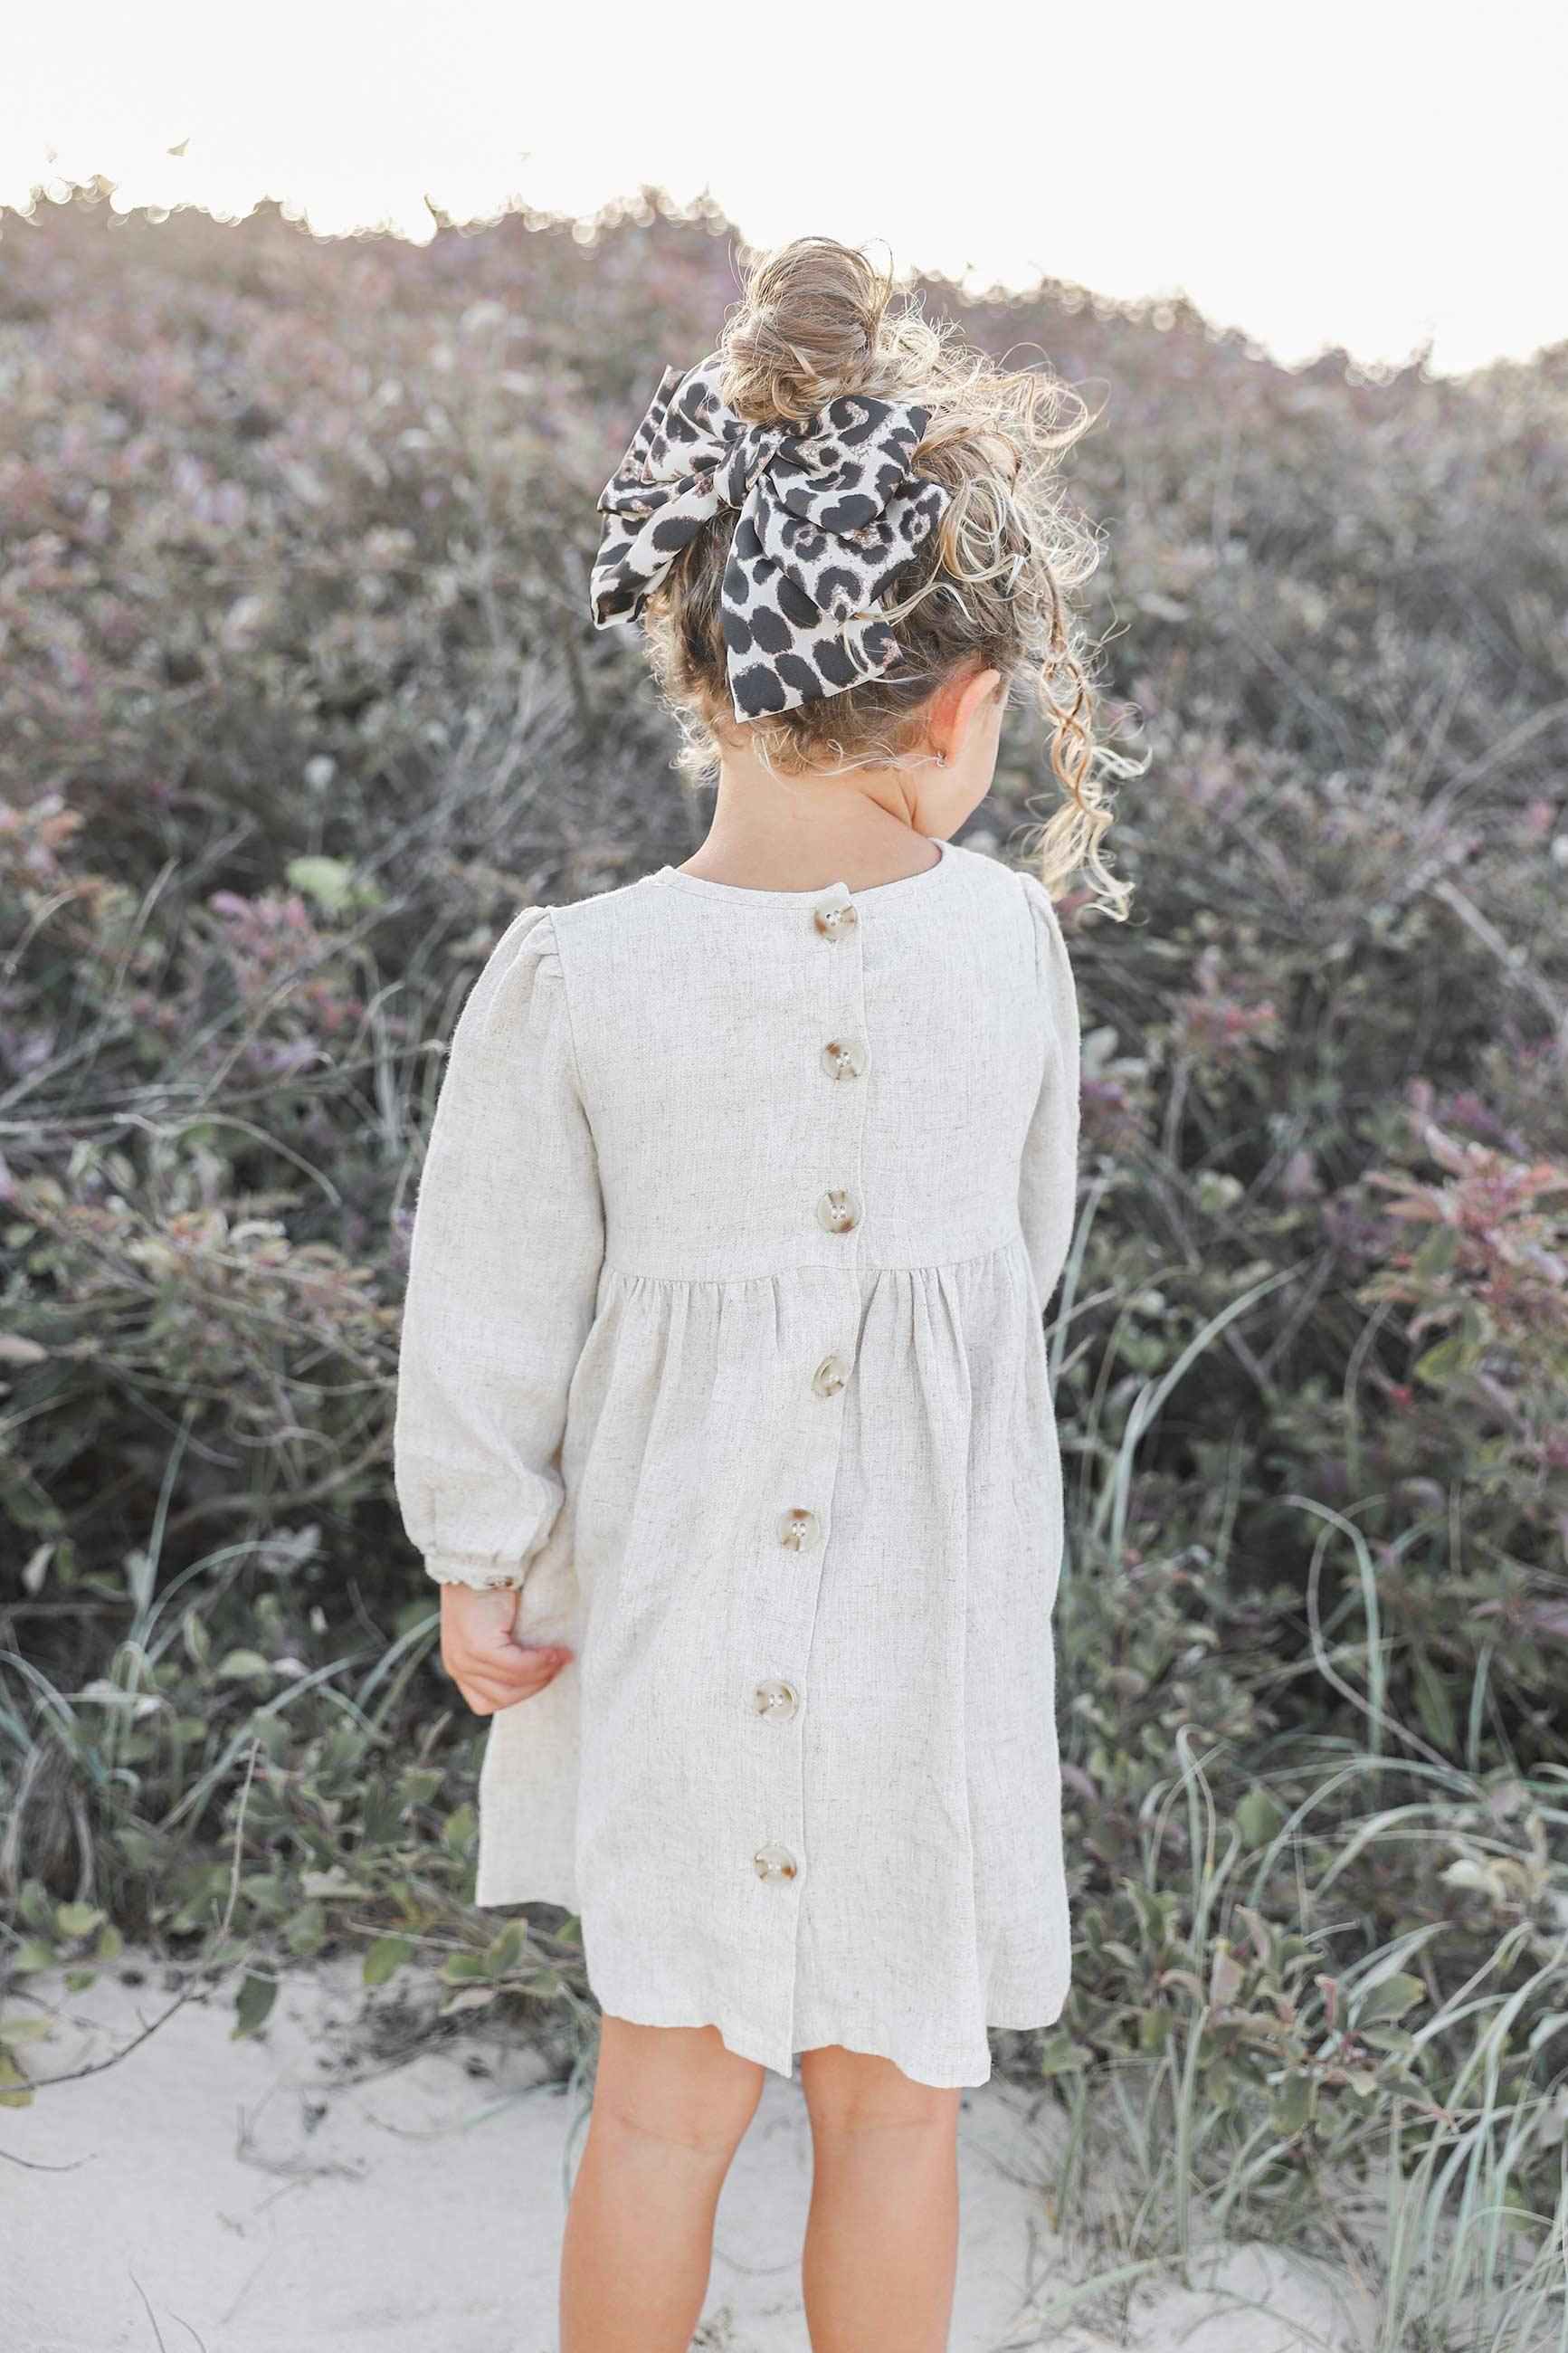 Molly Beige Linen Dress Raven Large Leopard Bow3